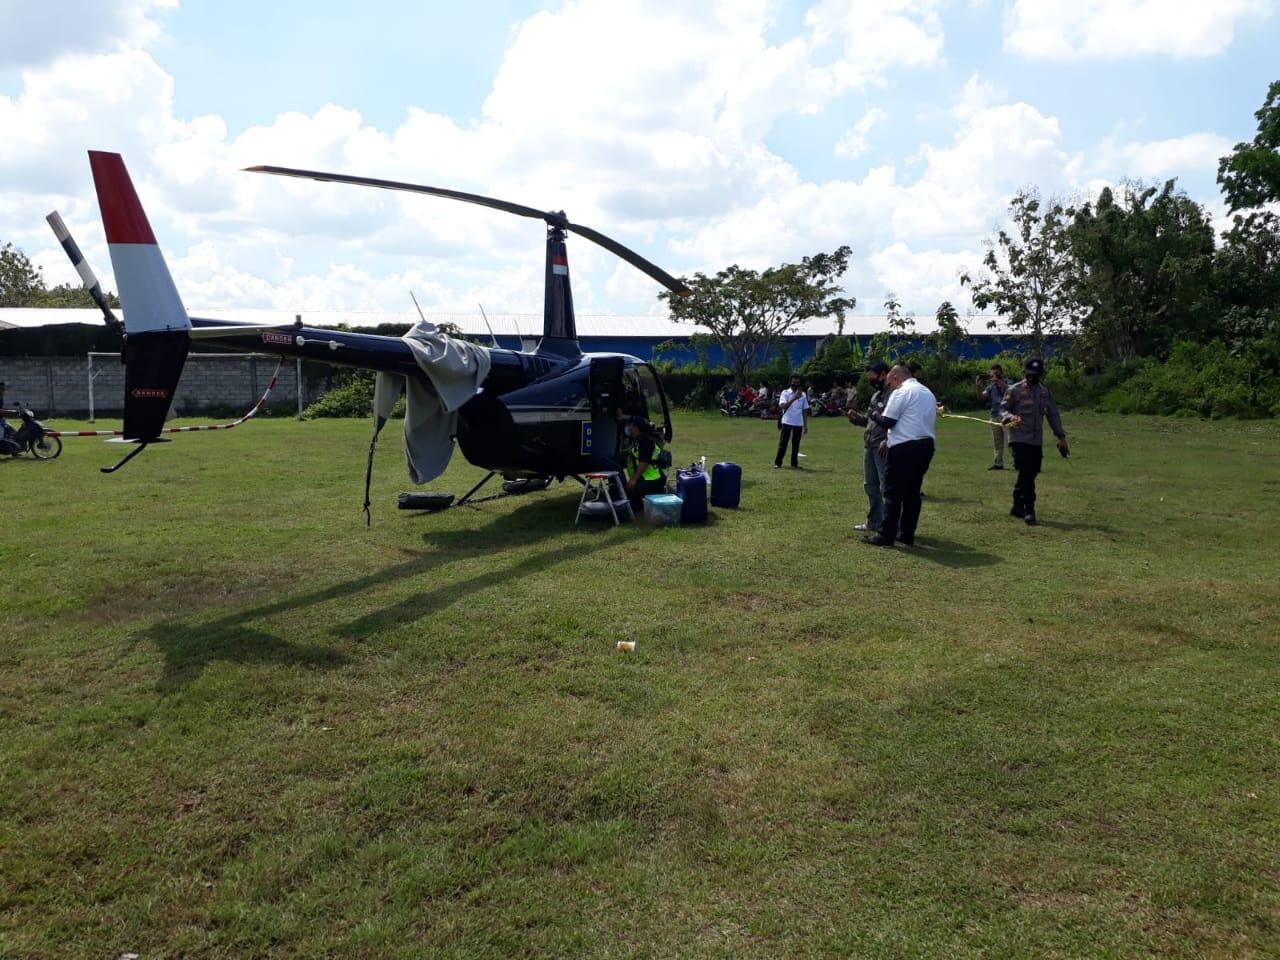 Helikopter BNPB melakukan pendaratan darurat di Lapangan Bola Desa Panunggalan, Kecamatan Pulokulon, Kabupaten Grobogan, Jawa Tengah, Rabu (16/6). Foto: BNPB